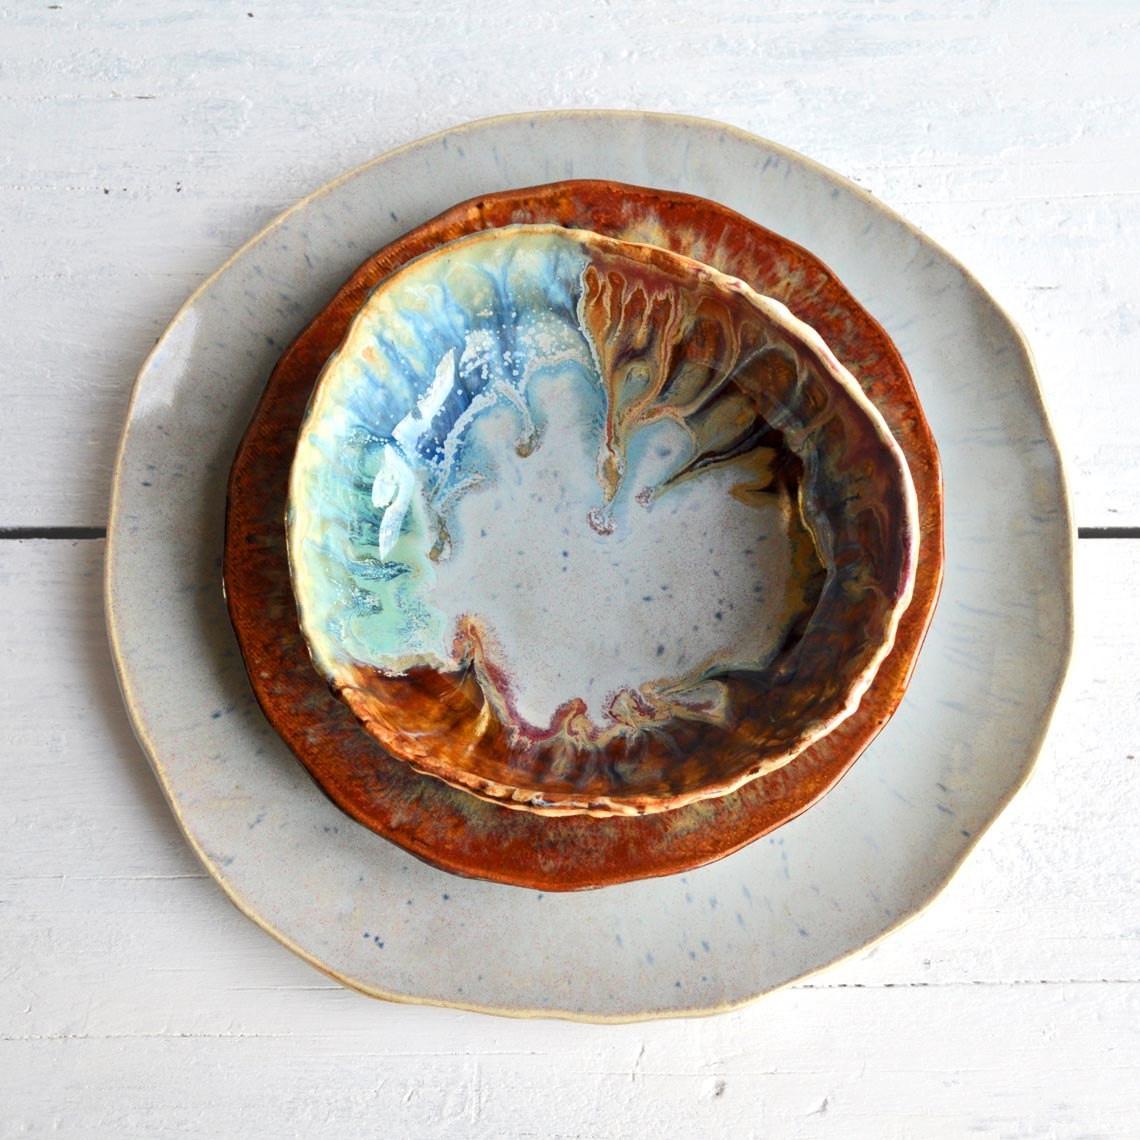 Handmade ceramic plates and bowls & Rustic Stoneware Dinnerware - Foter